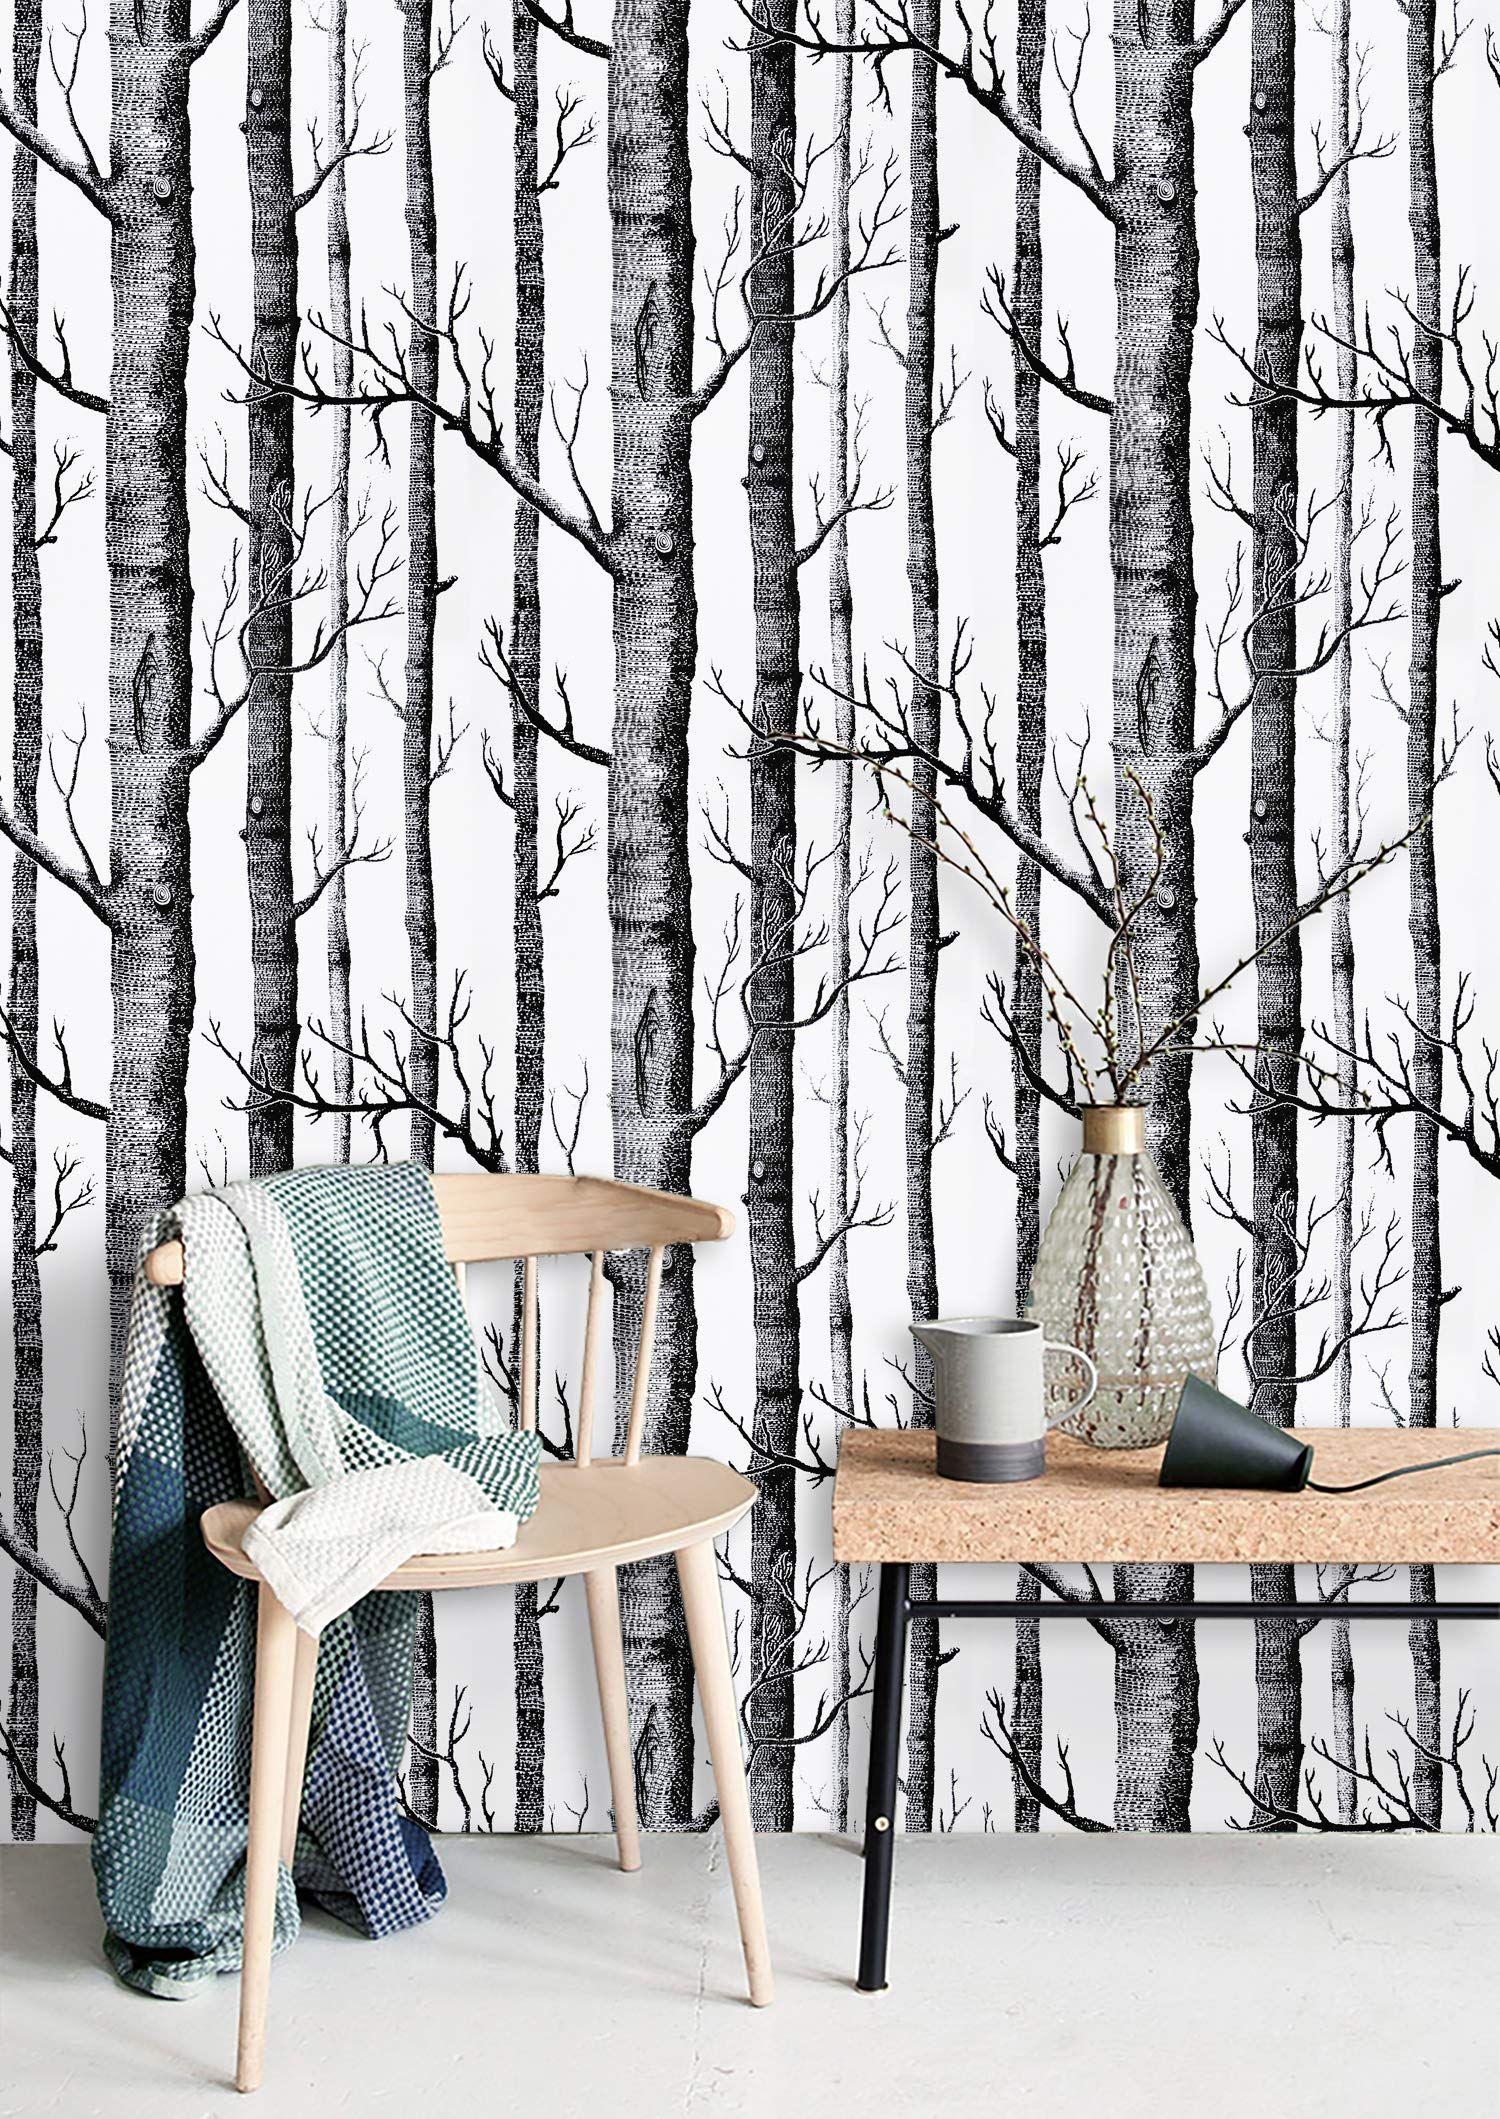 17 7 X 118 Birch Tree Wallpaper Black And White Peel And Stick Wallpaper Black Contact Pap Tree Wallpaper Black And White Birch Tree Wallpaper Wall Coverings